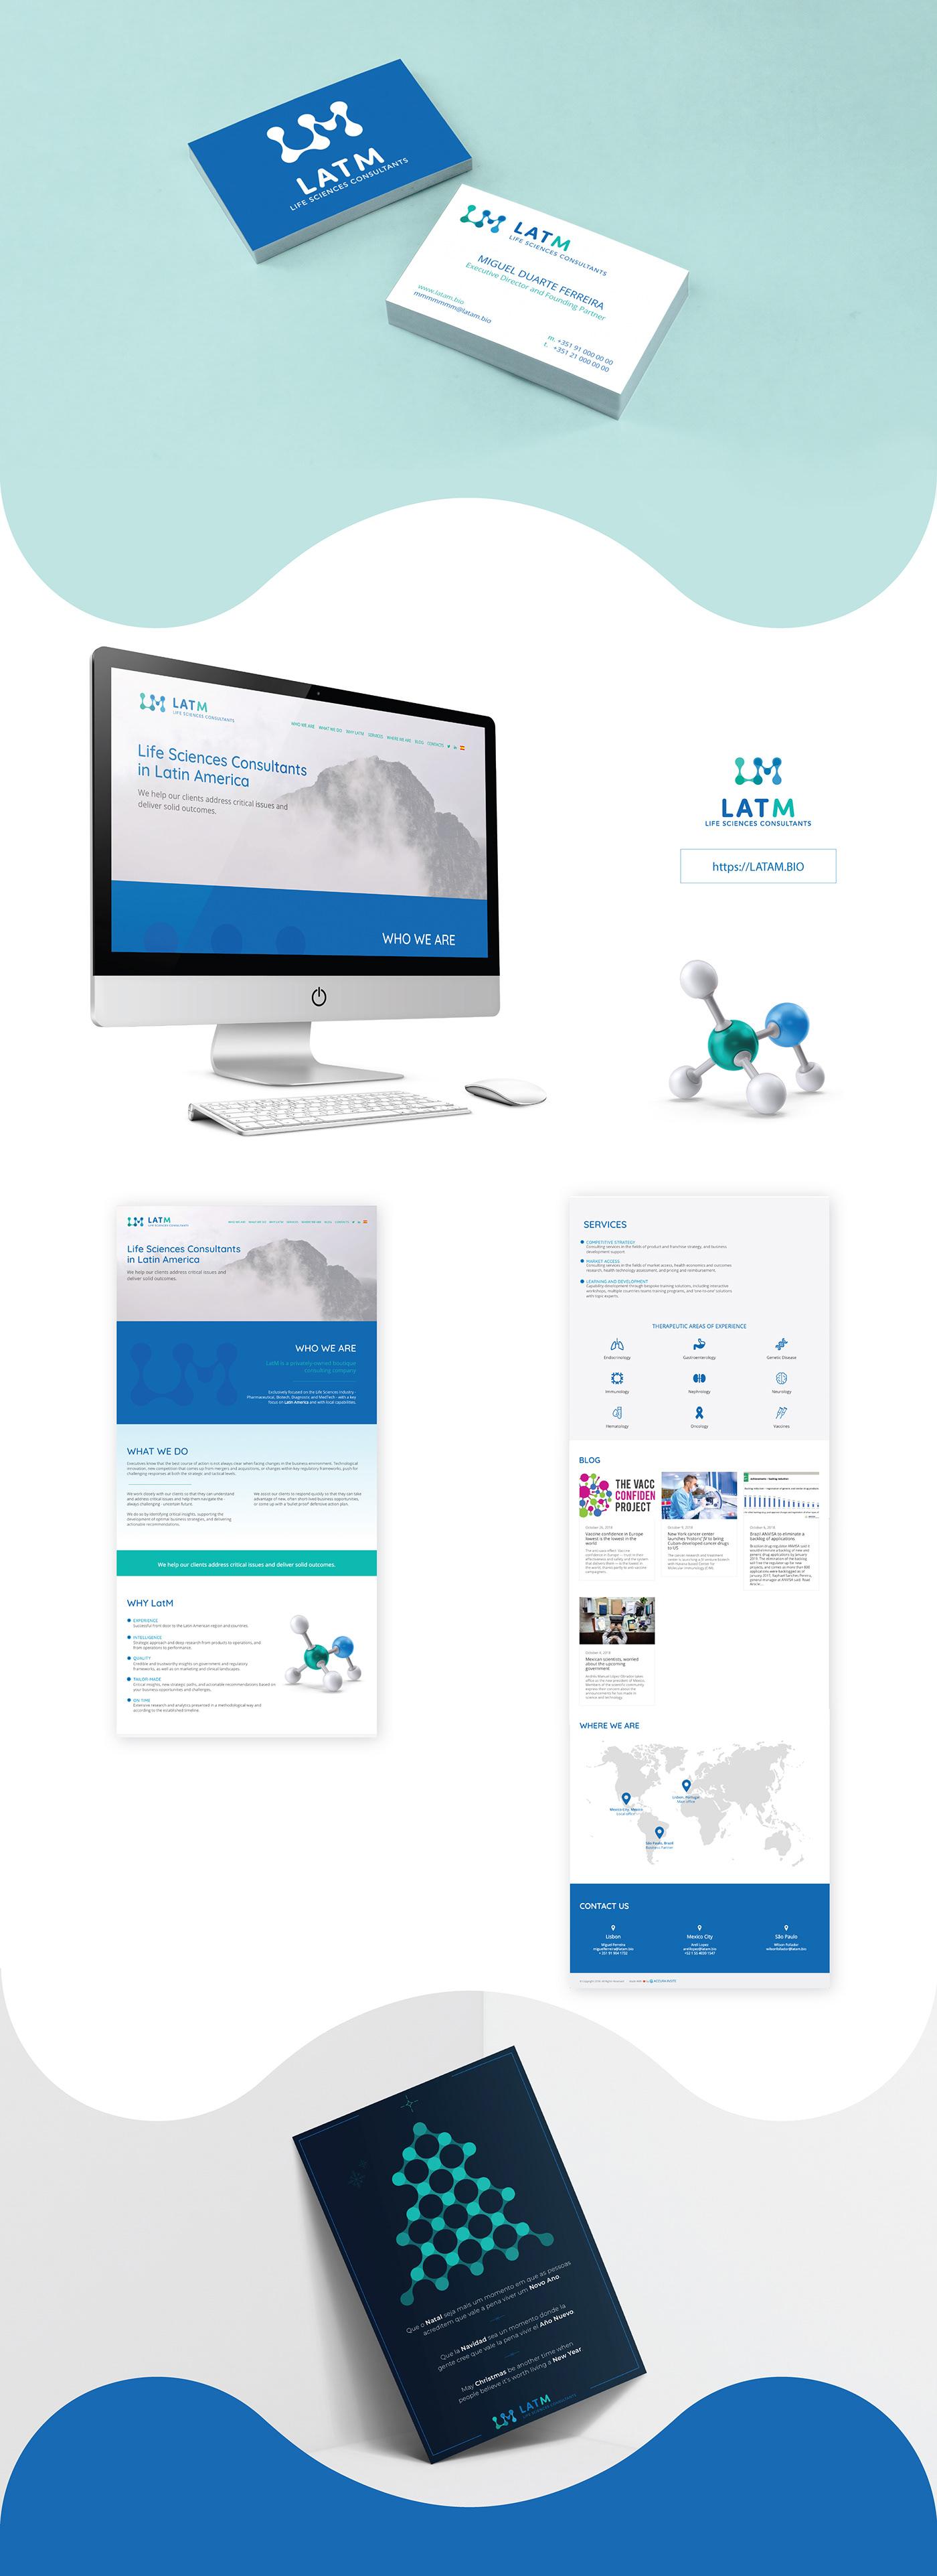 branding  logo Logotype Webdesign graphic design  identity Corporate Identity